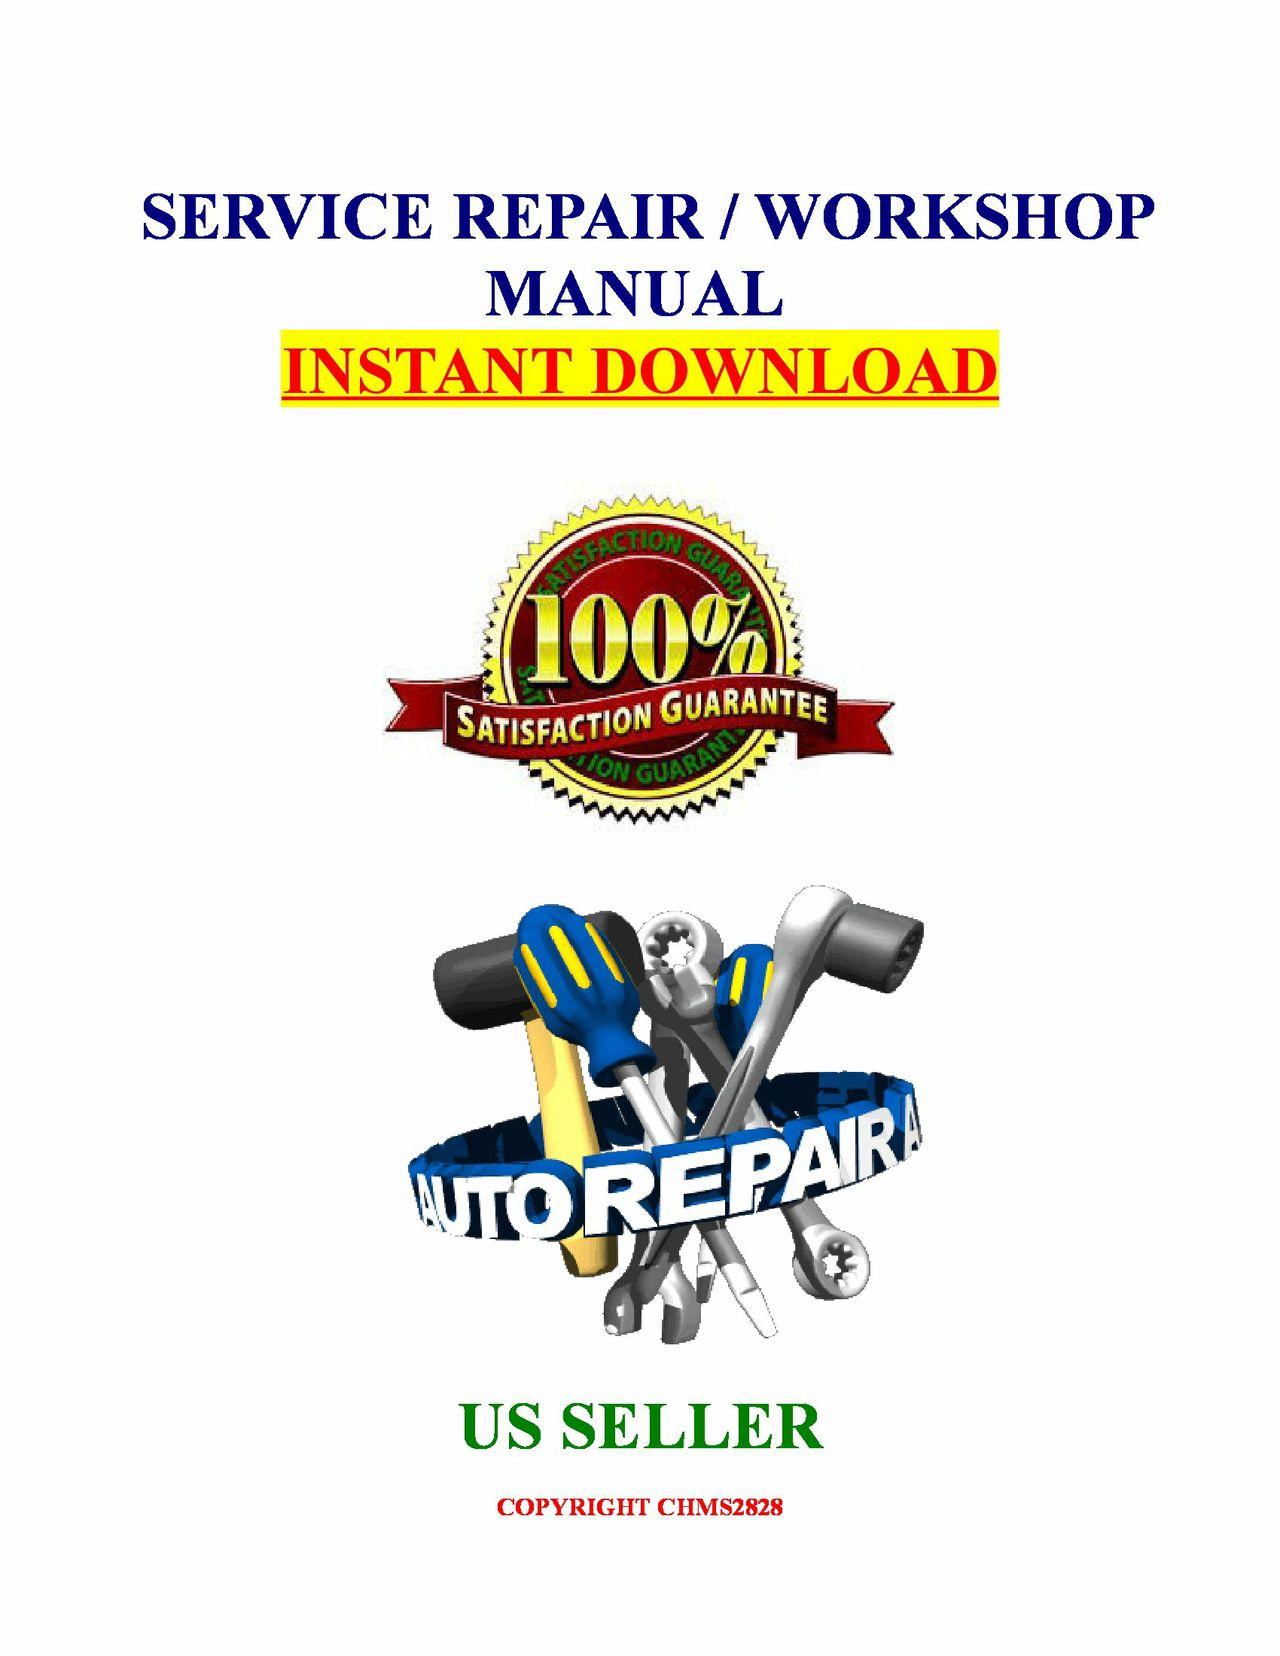 Suzuki VS700 VS800 Intruder 1989 1990 1991 1992 1993 1994 1995 1996 Motorcycle service repair manual